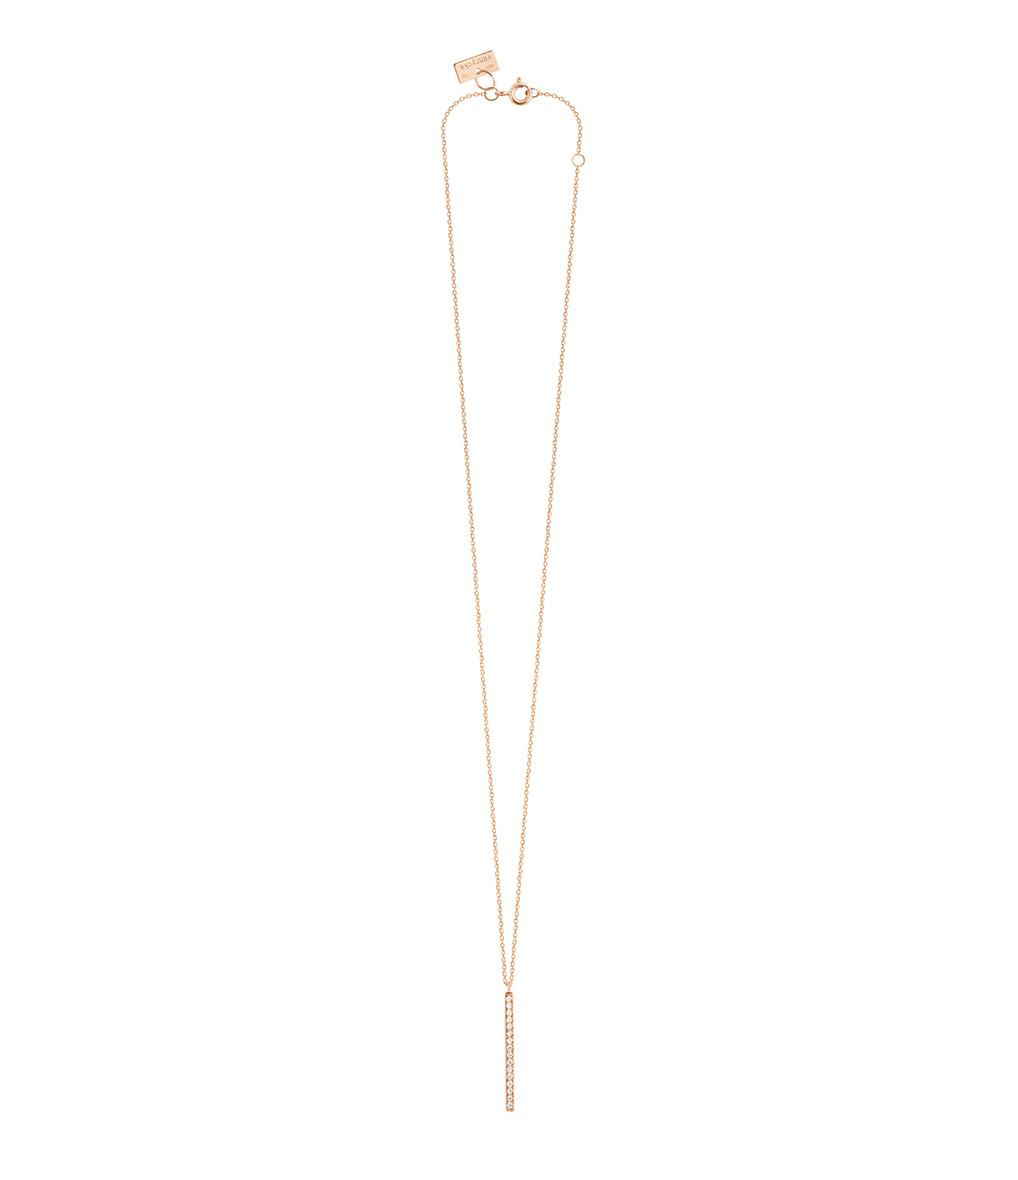 VANRYCKE - Collier Medellin Or Rose Diamants